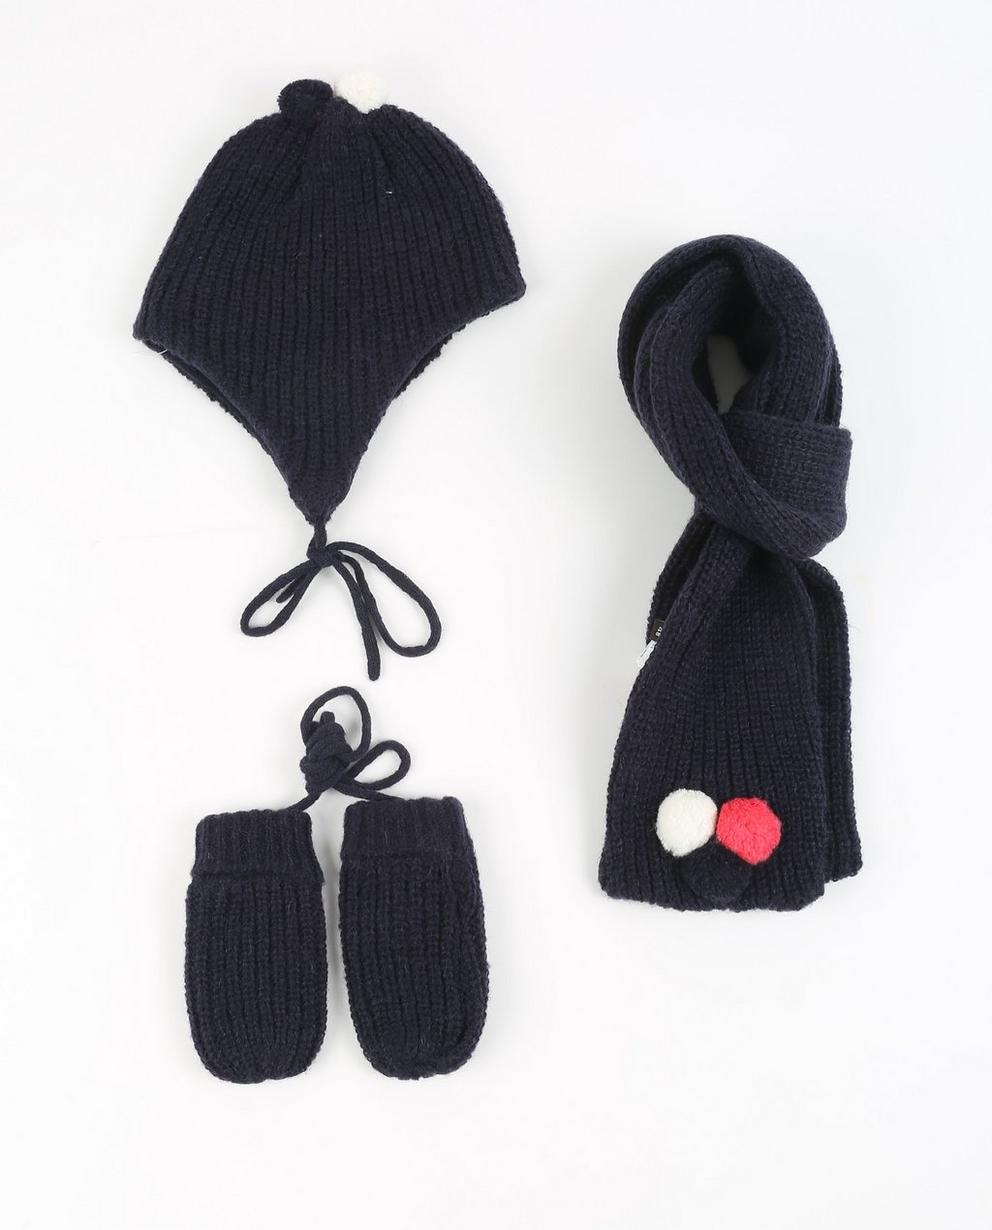 Muts, sjaal en wanten - in donkerblauw - JBC